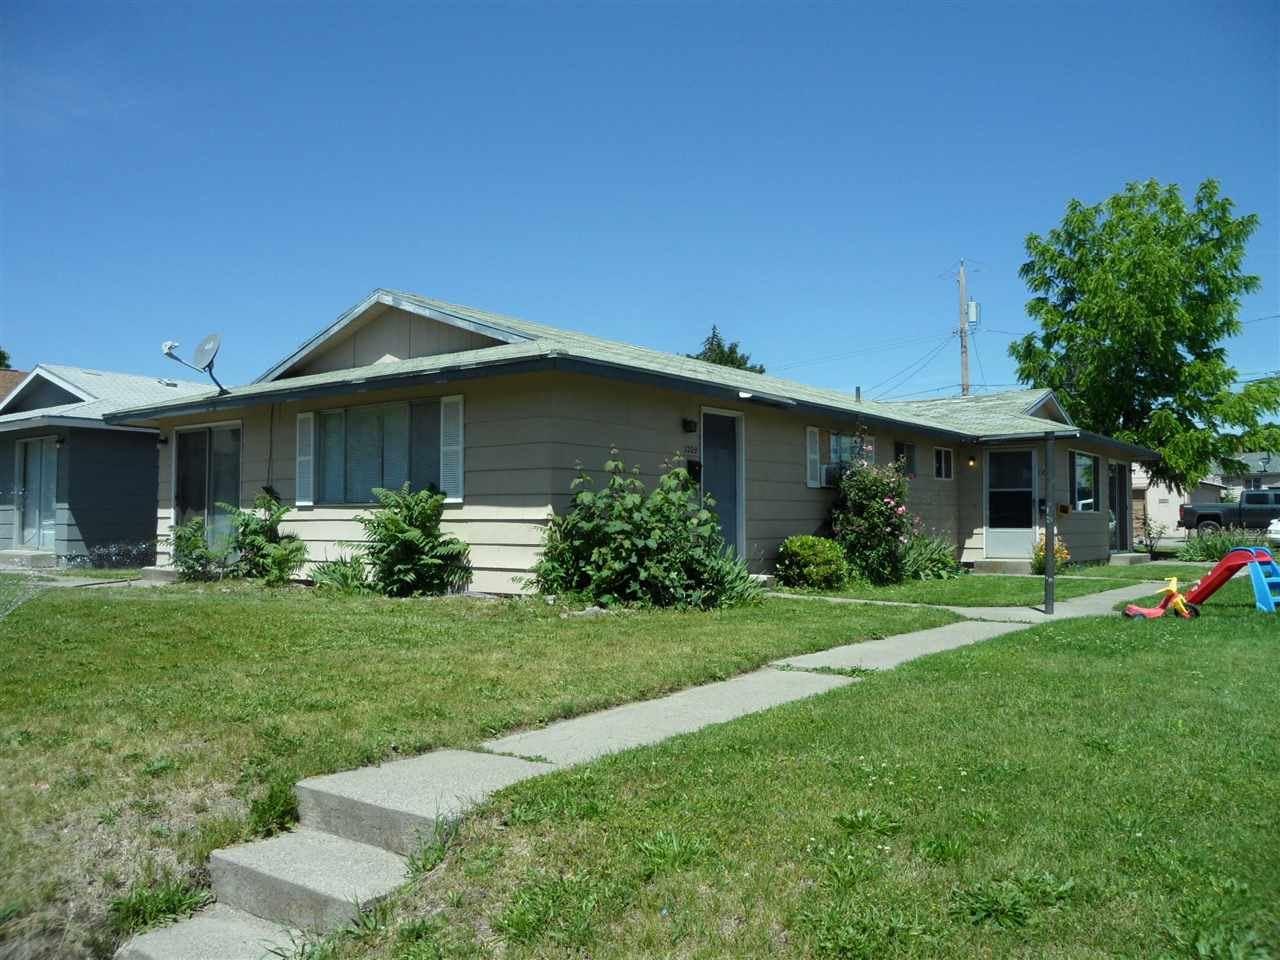 1225 E Nora Ave #1223 E Nora Ave, Spokane, WA 99207 - #: 202018008